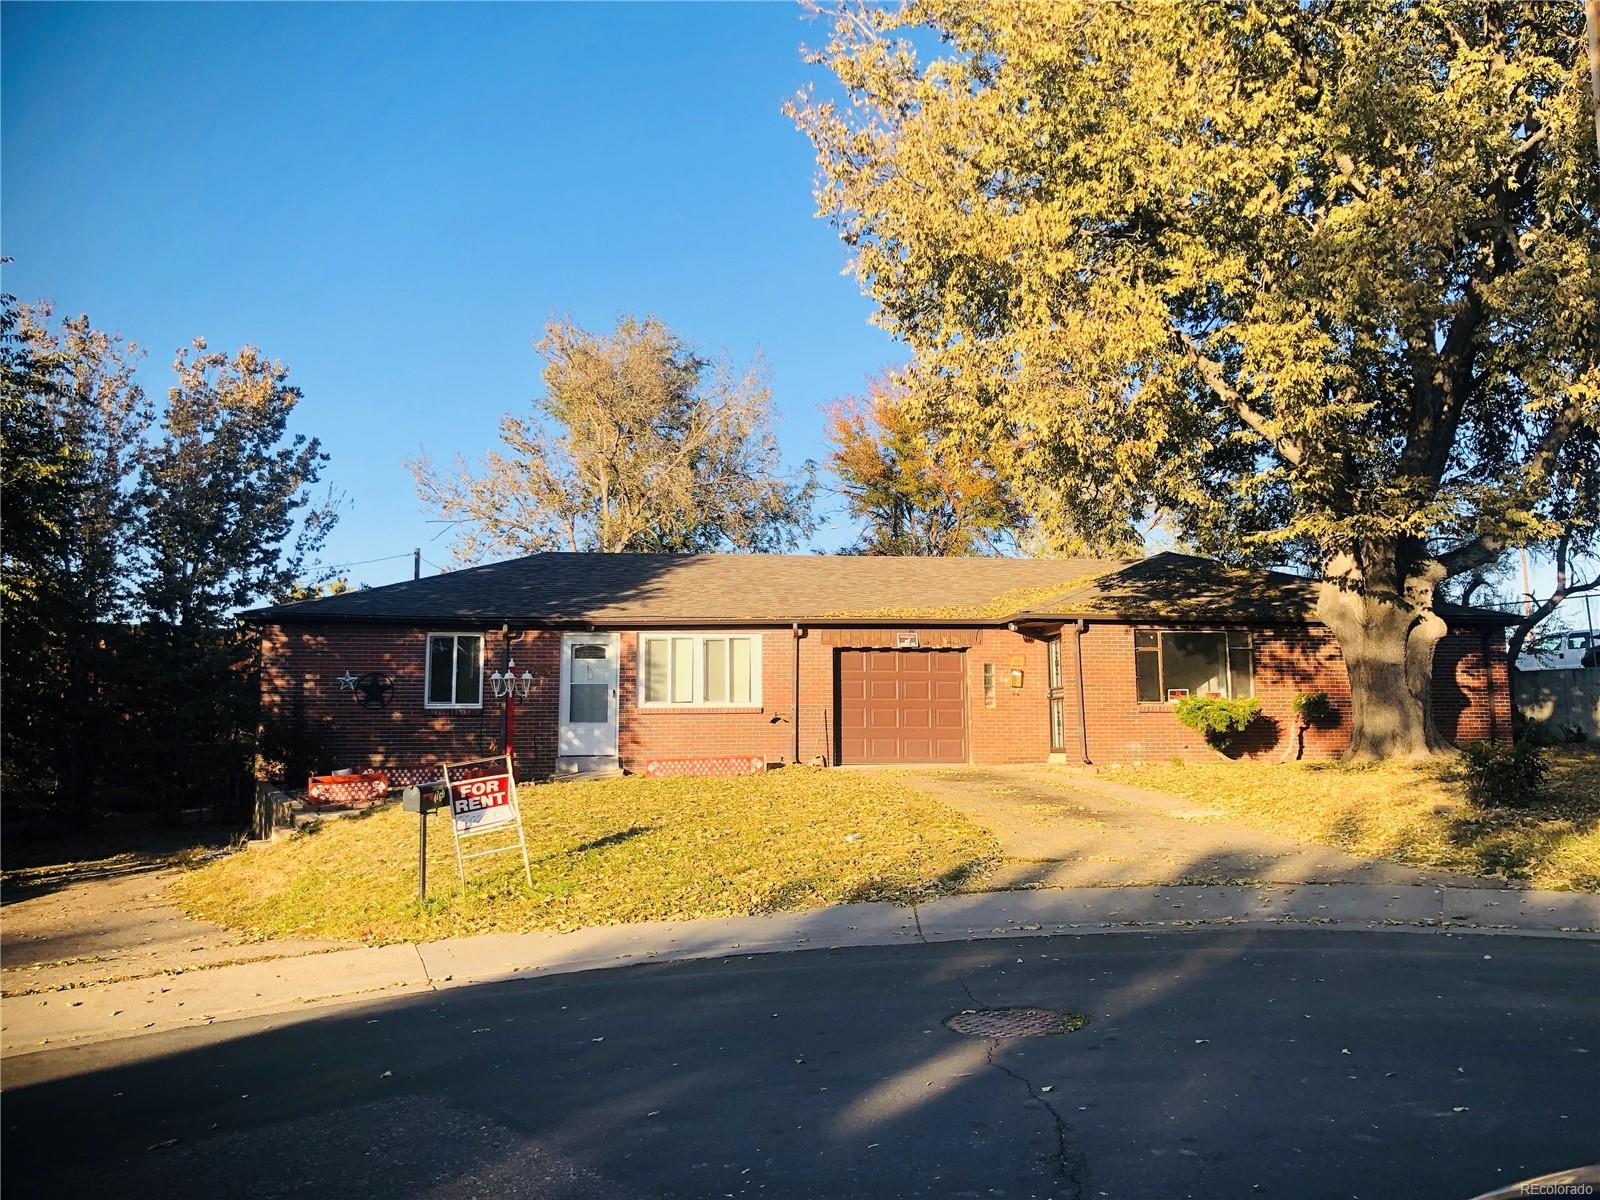 4750 Ingalls Street, Wheat Ridge, CO 80033 - Wheat Ridge, CO real estate listing